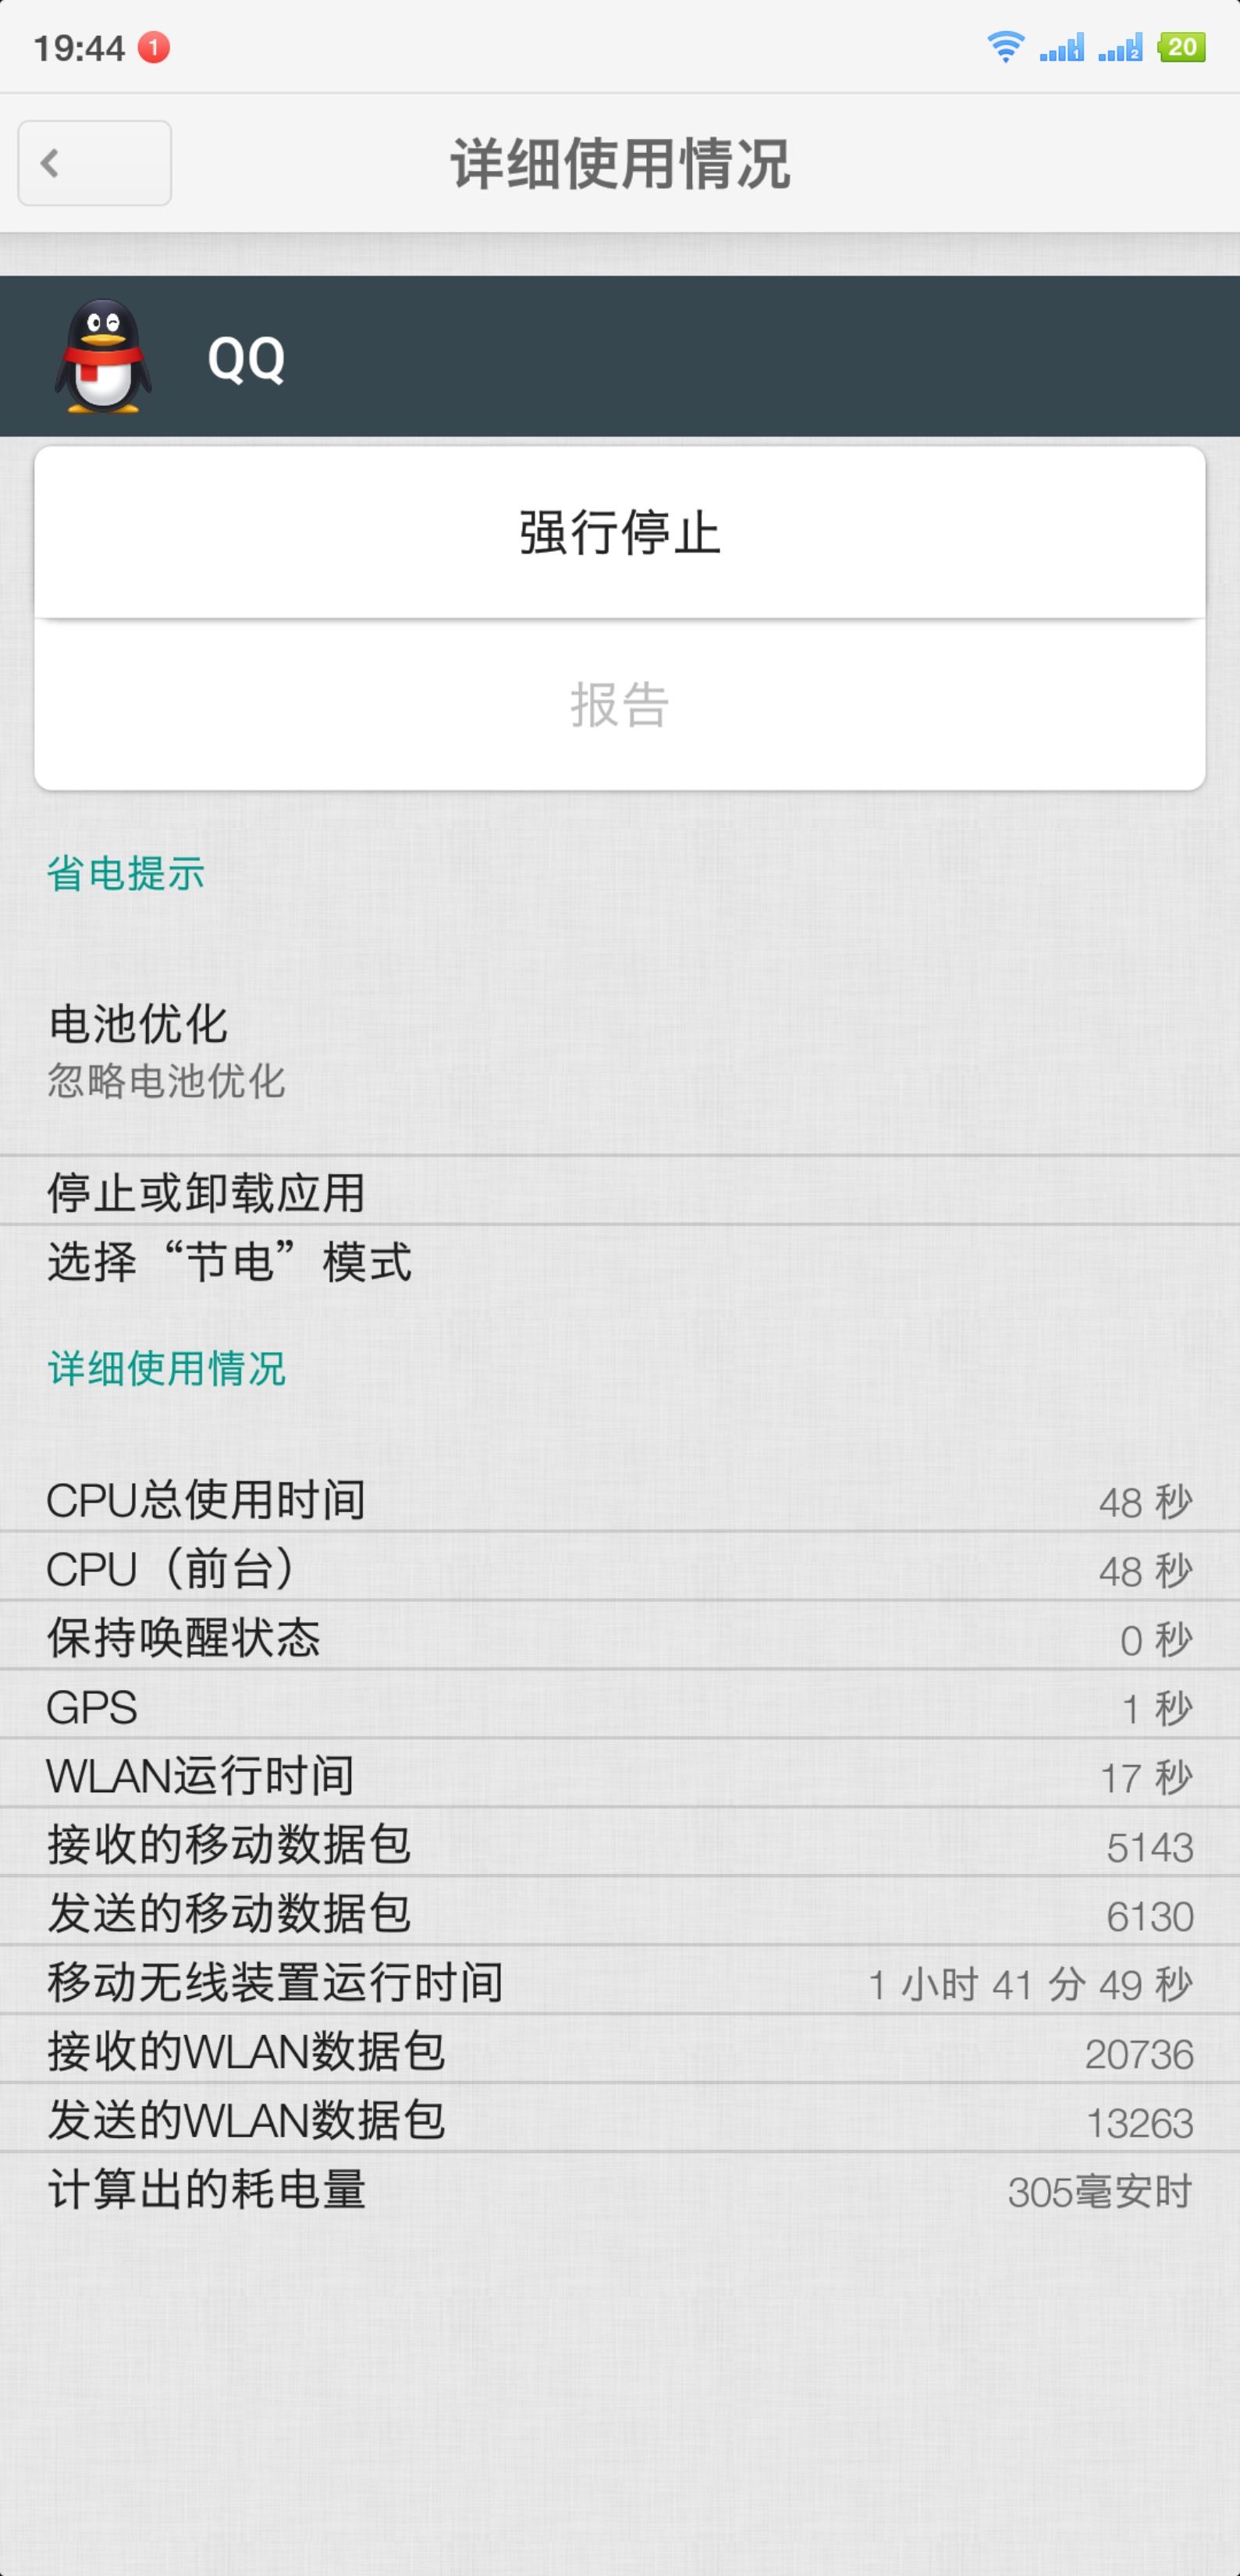 Screenshot_2018-07-12-19-44-46-516_??.png